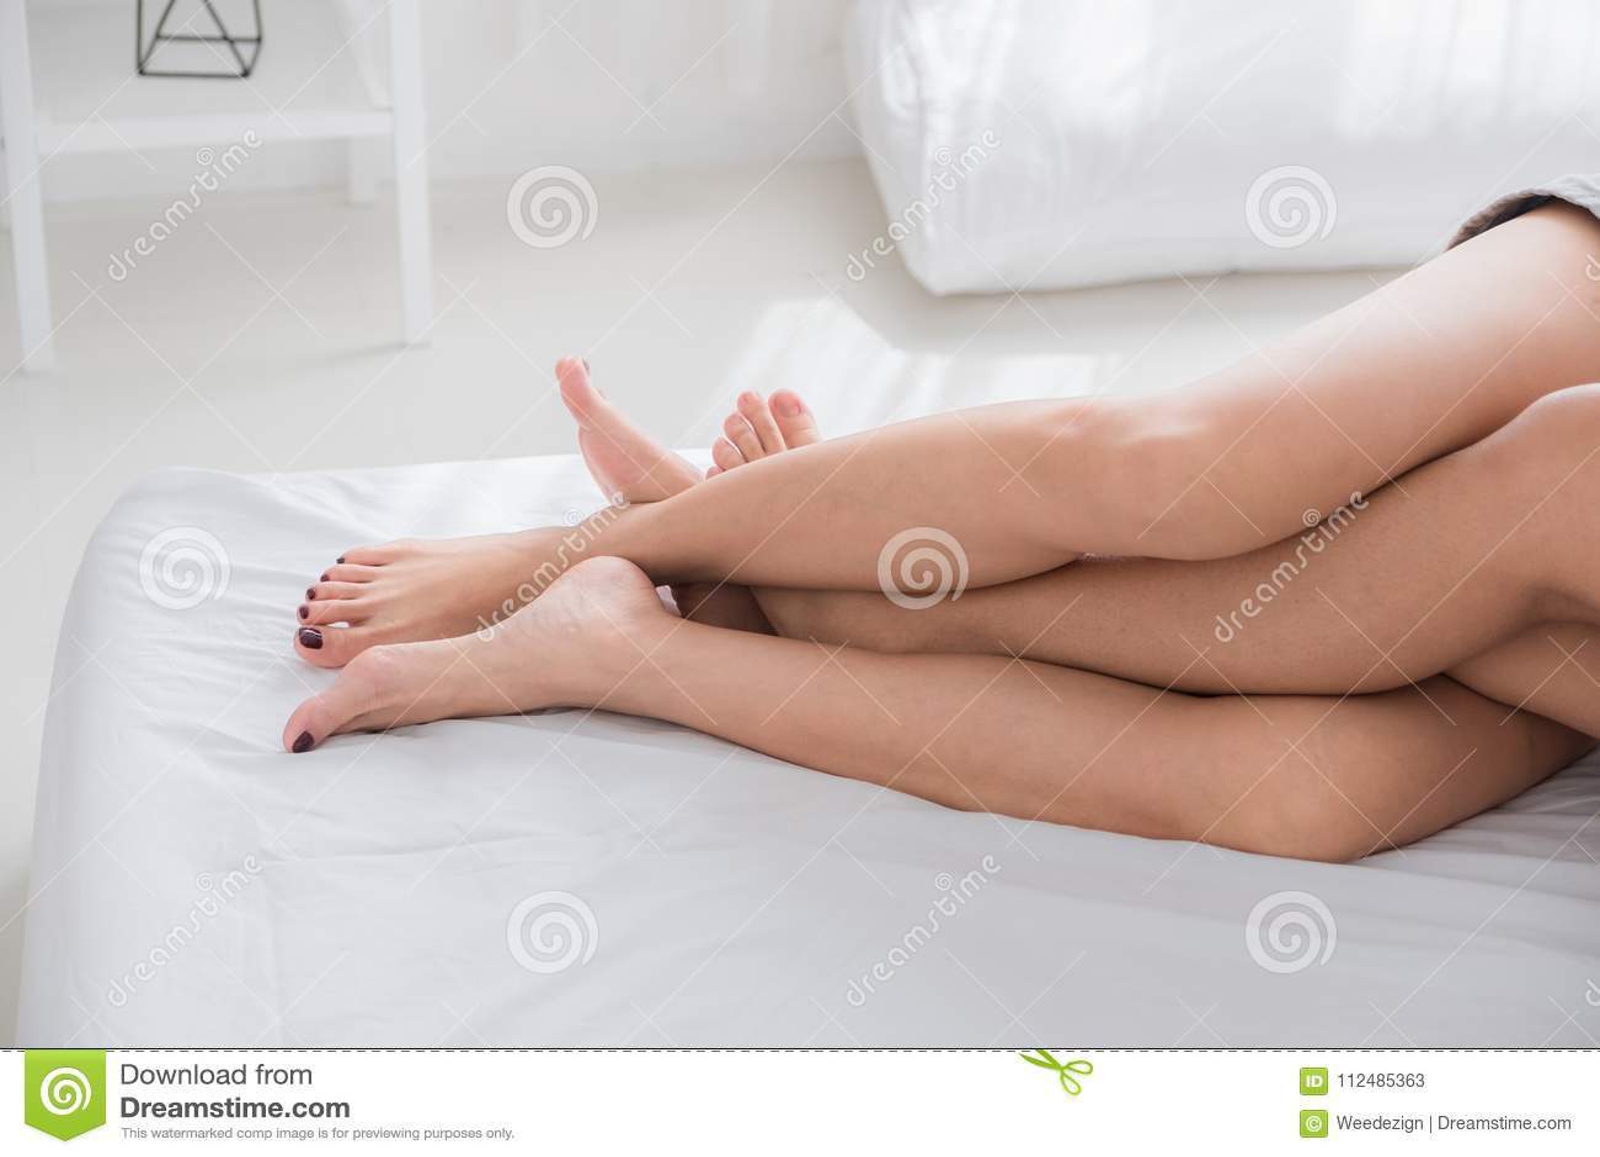 lesben massage